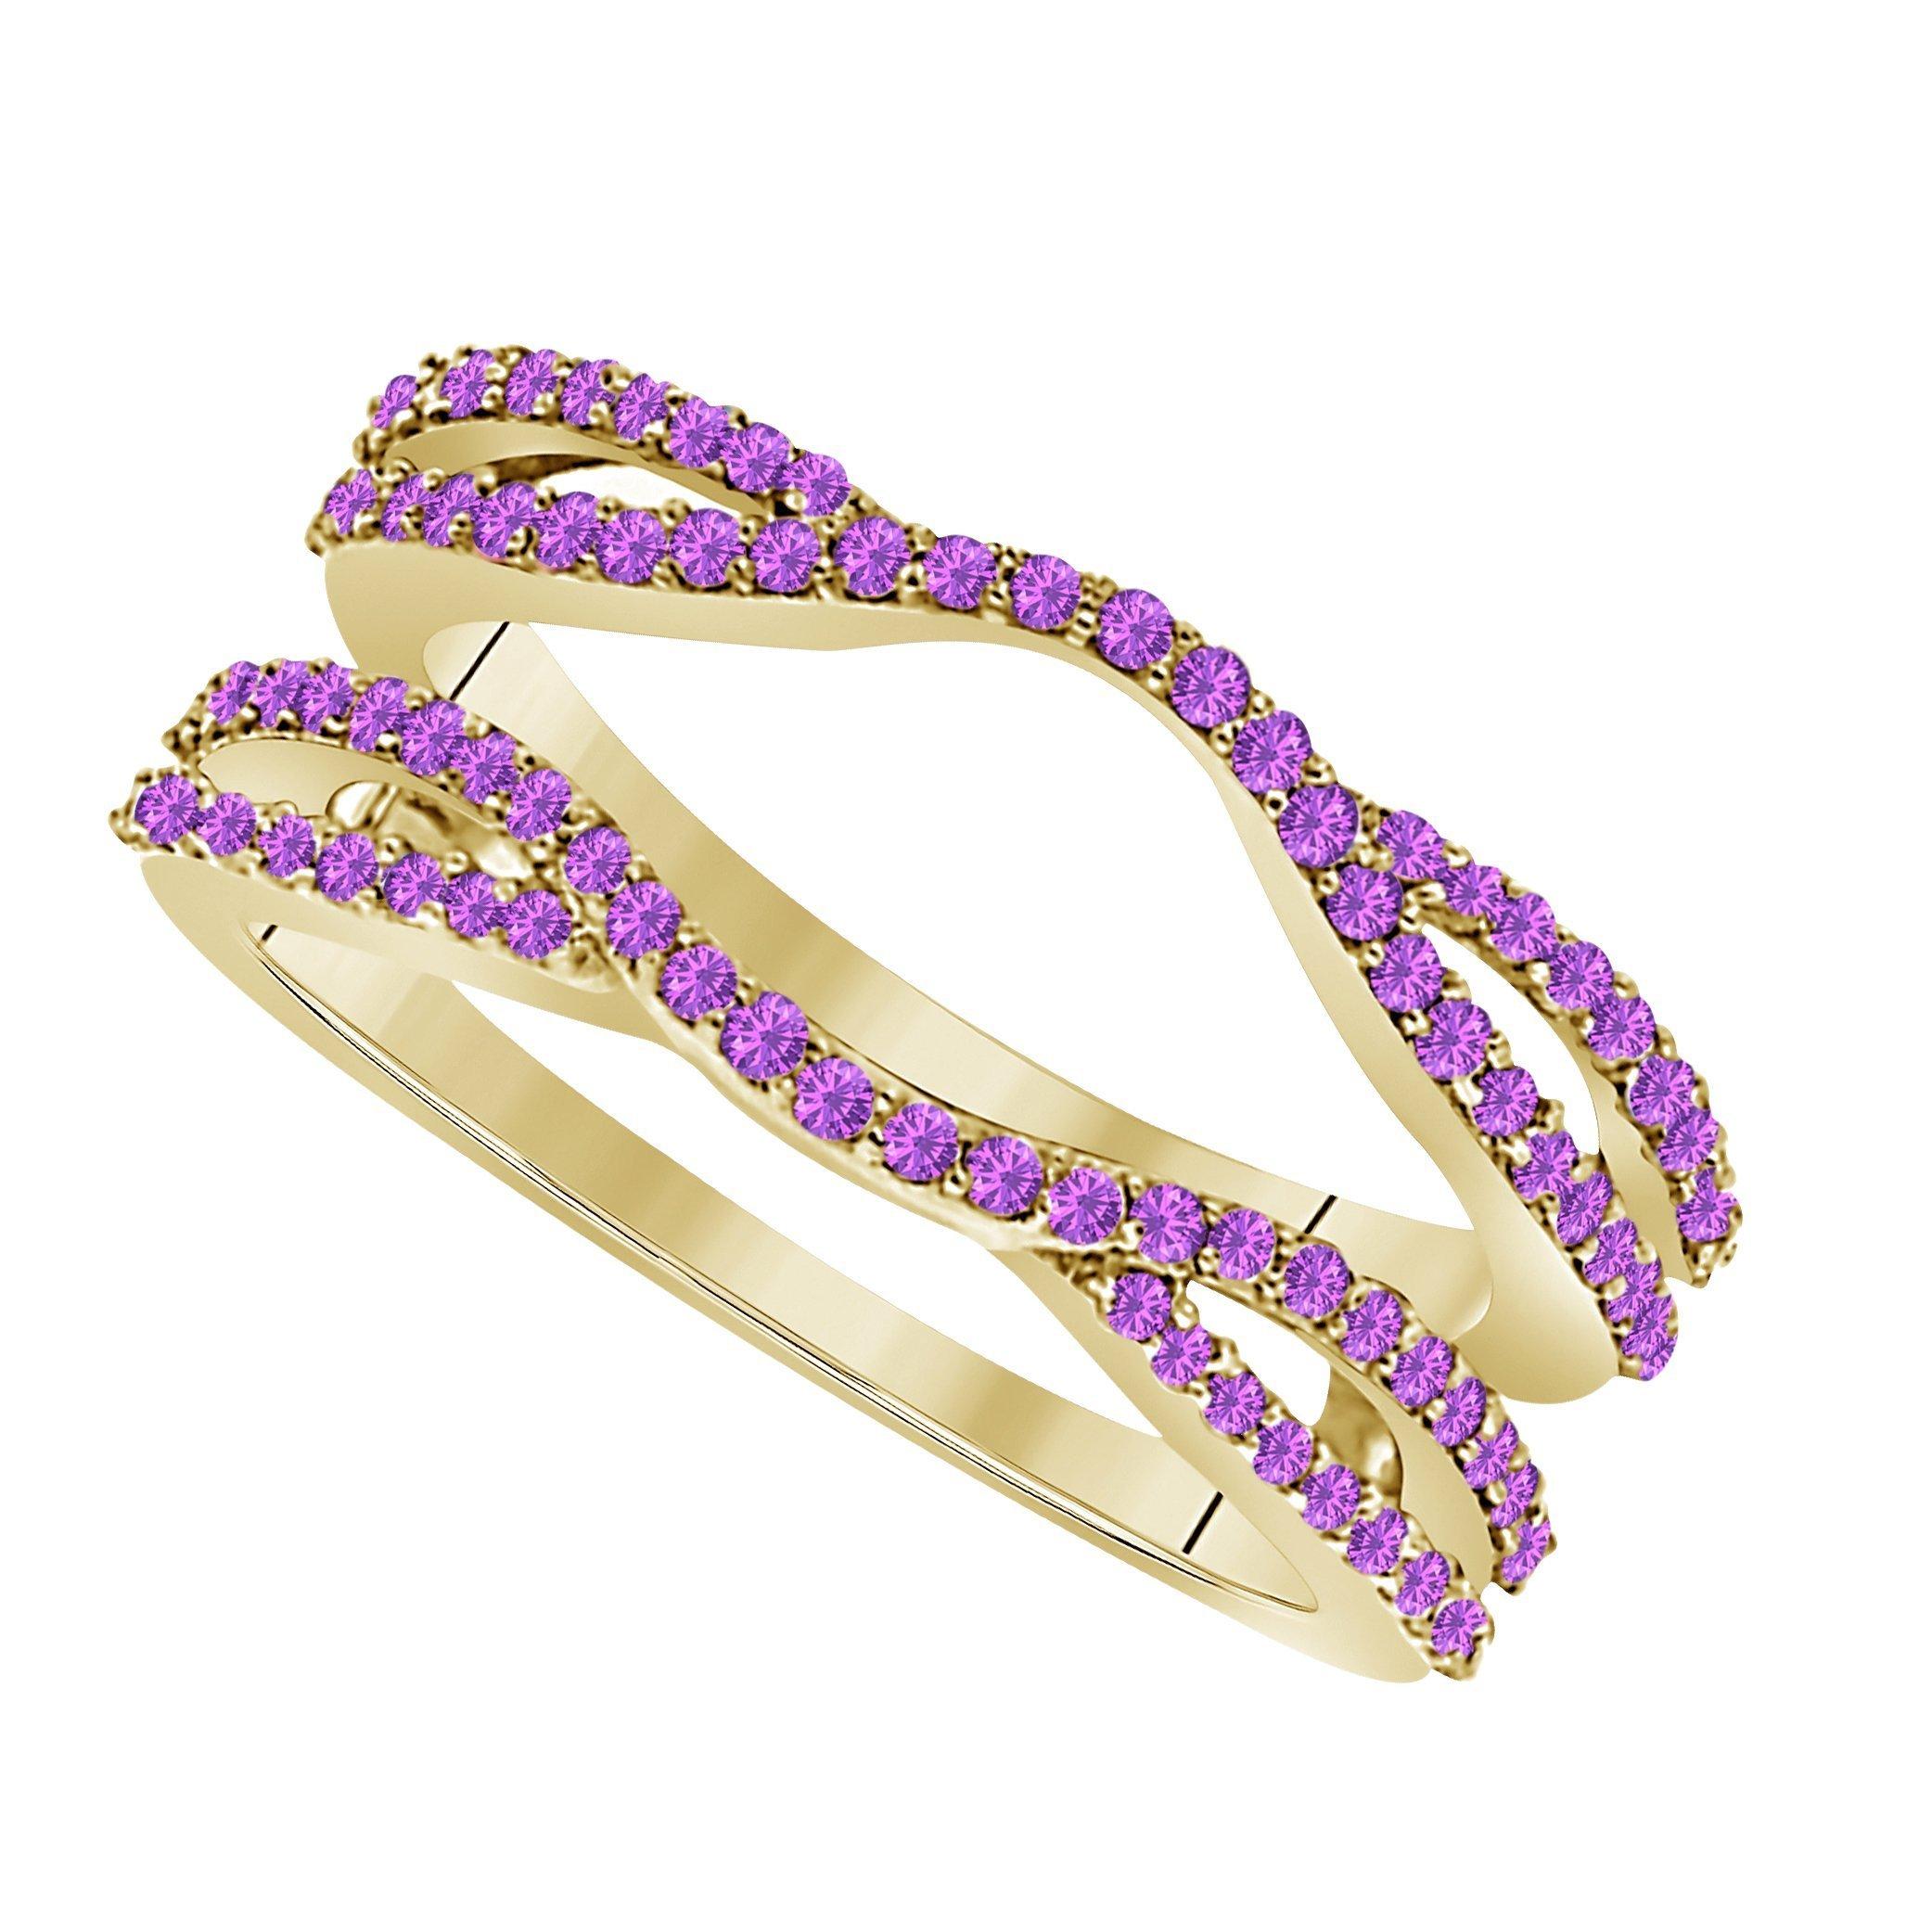 Star Retail 1/2 Ct 14K Yellow Gold Finish Round Cut Lab Created Amethyst Ladies Anniversary Wedding Band Enhancer Guard Double Chevron Ring